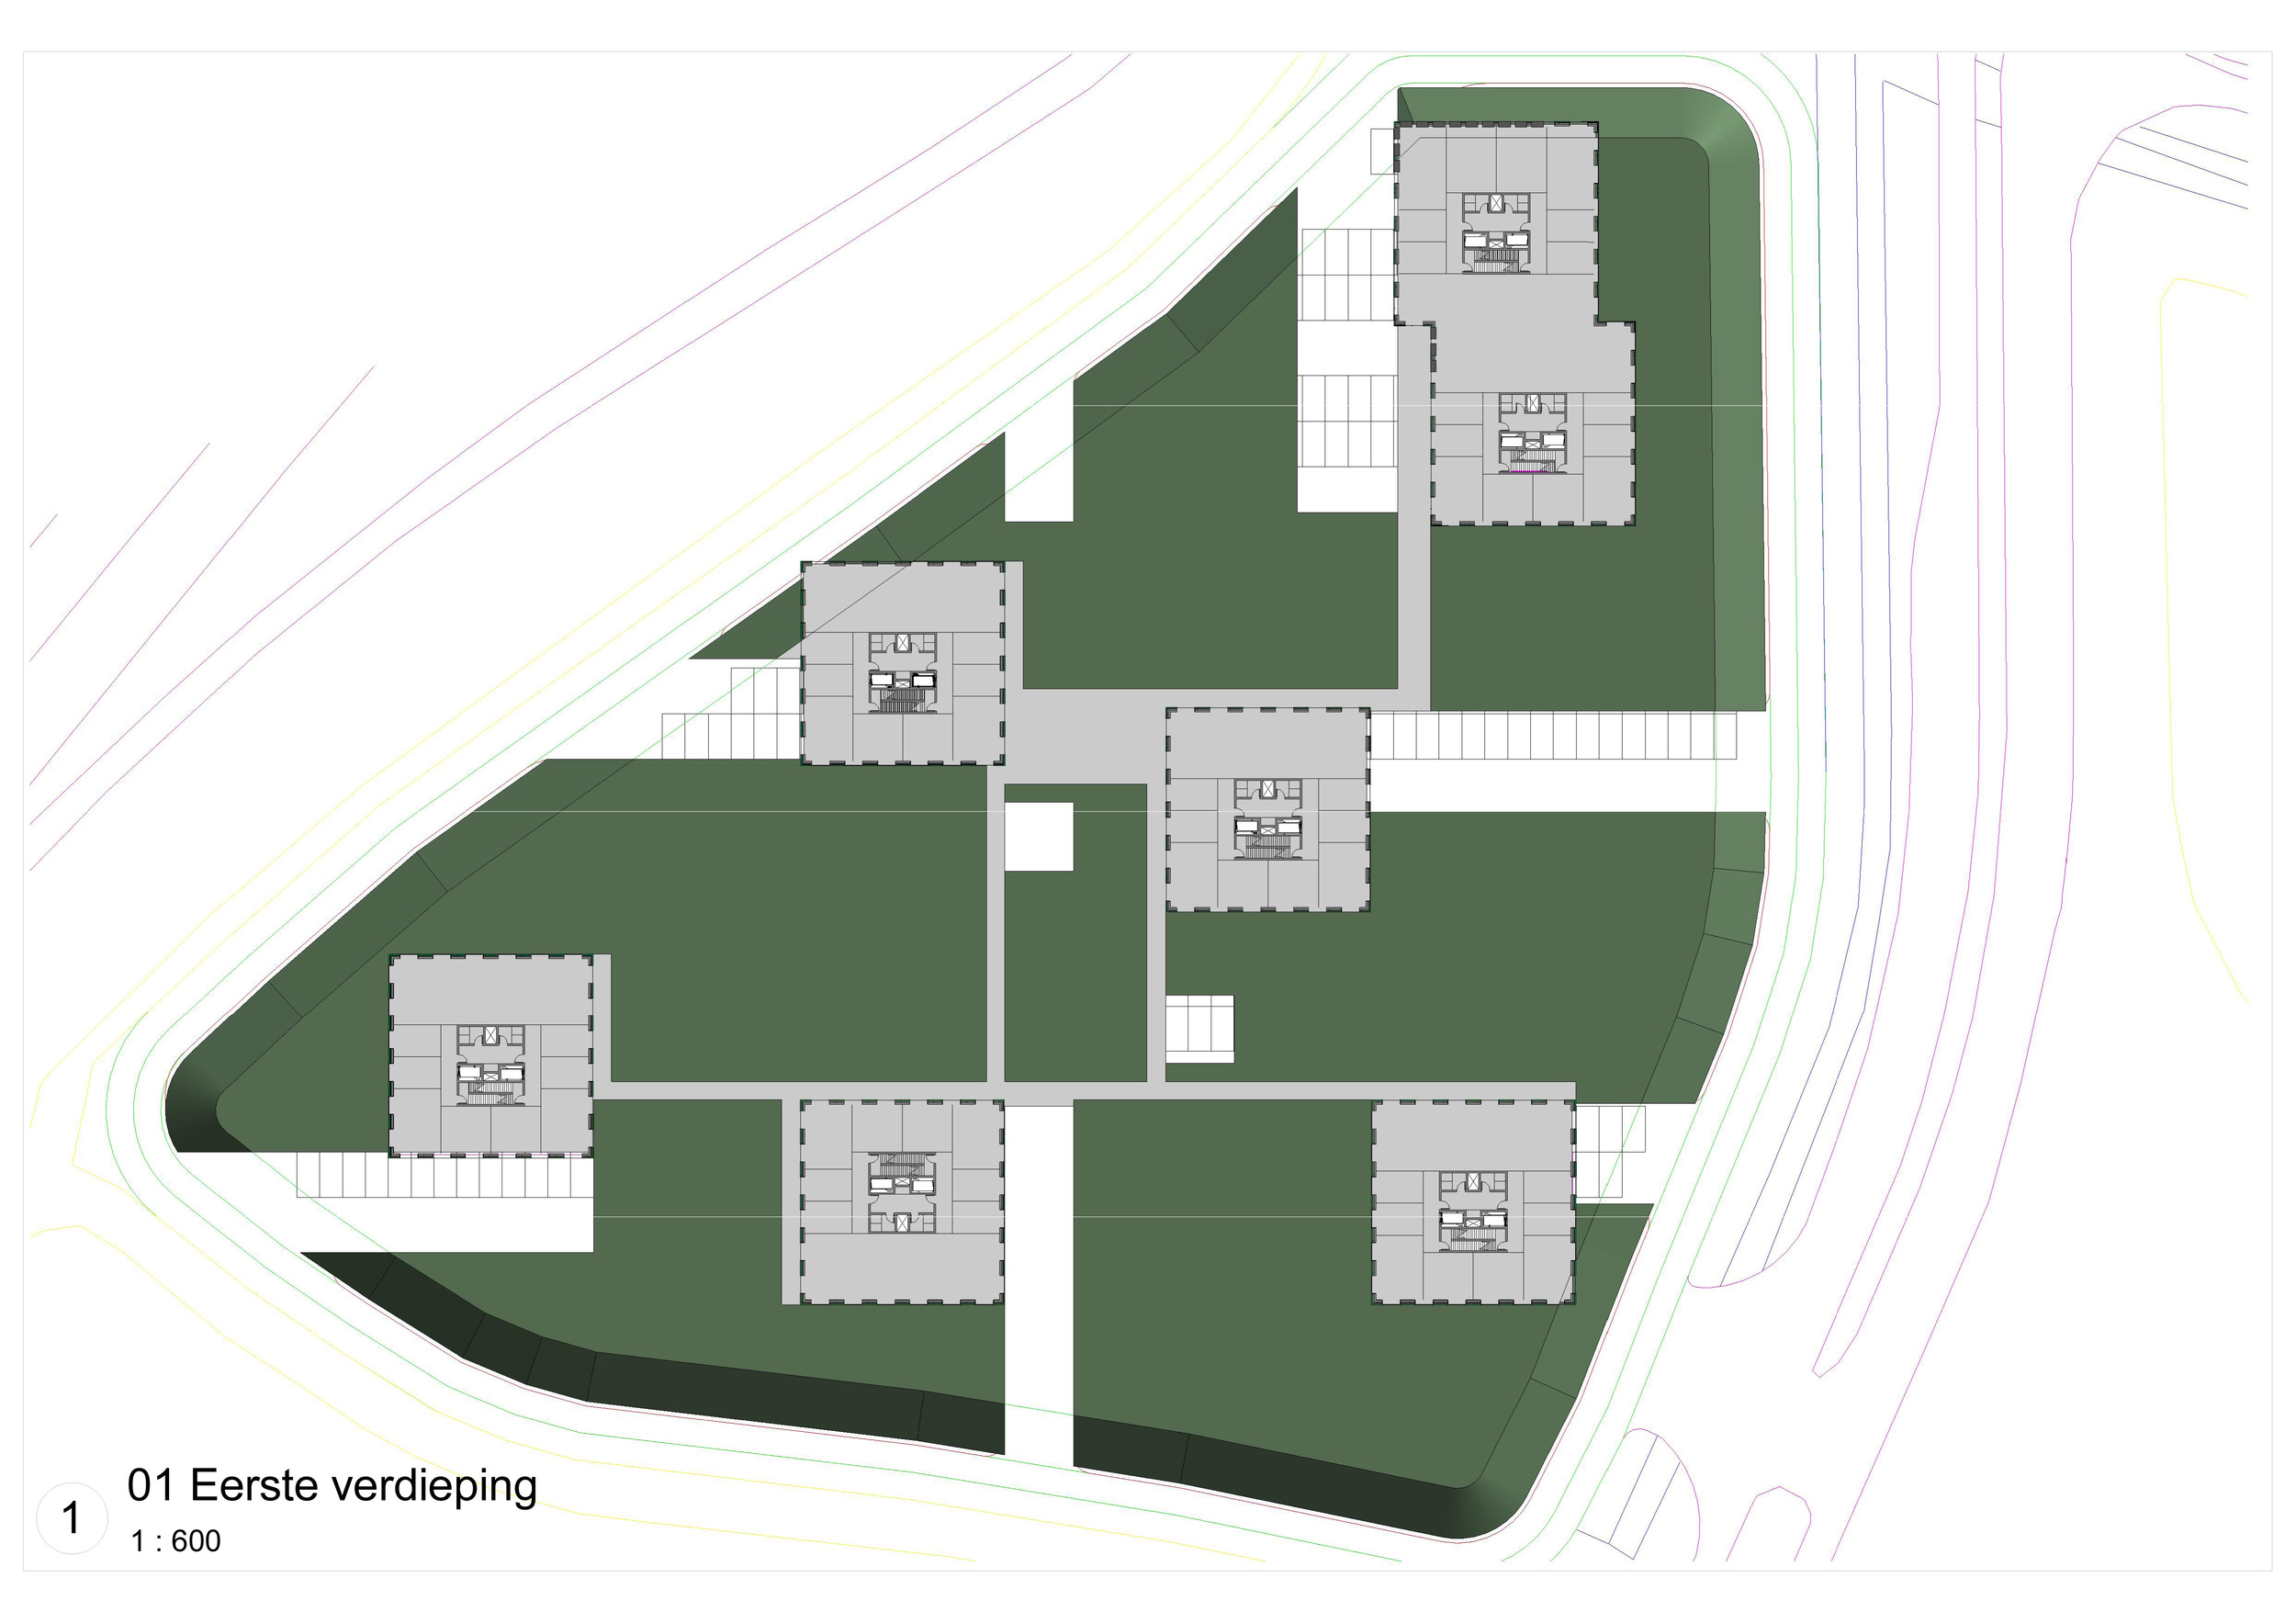 P8,  Kantoorbebouwing - Alkmaar